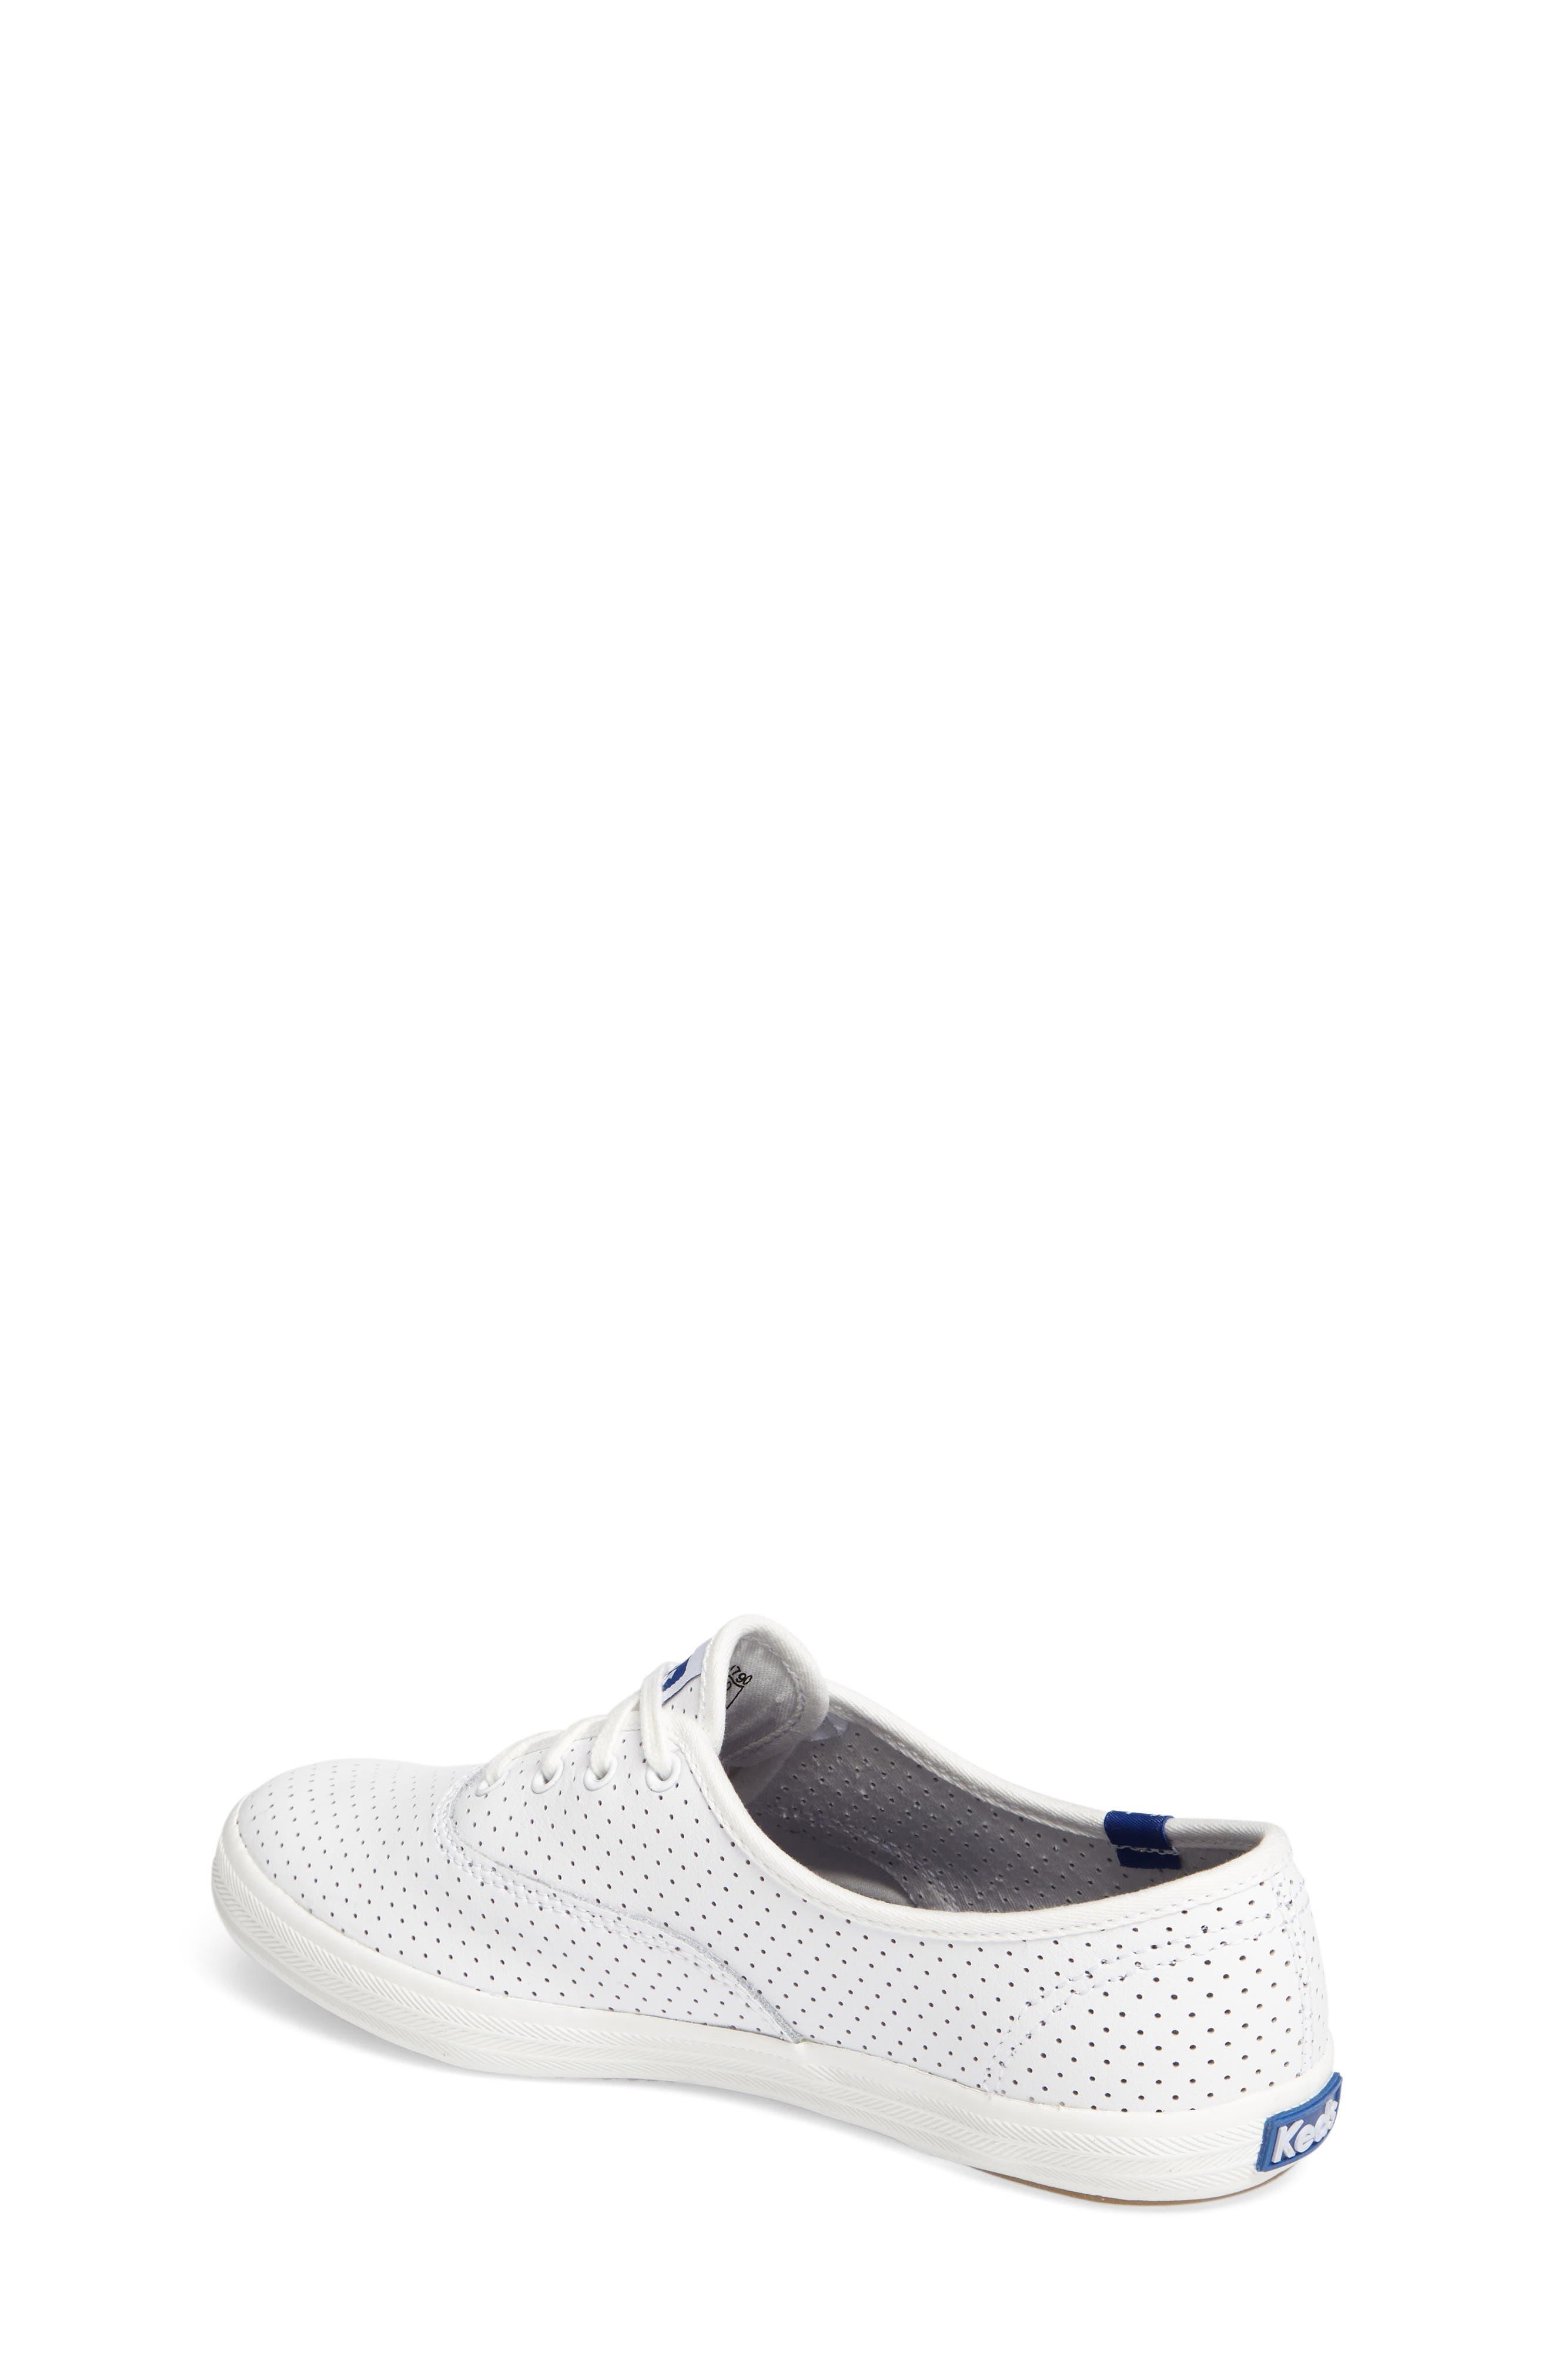 Alternate Image 2  - Keds® Champion Perforated Sneaker (Women)